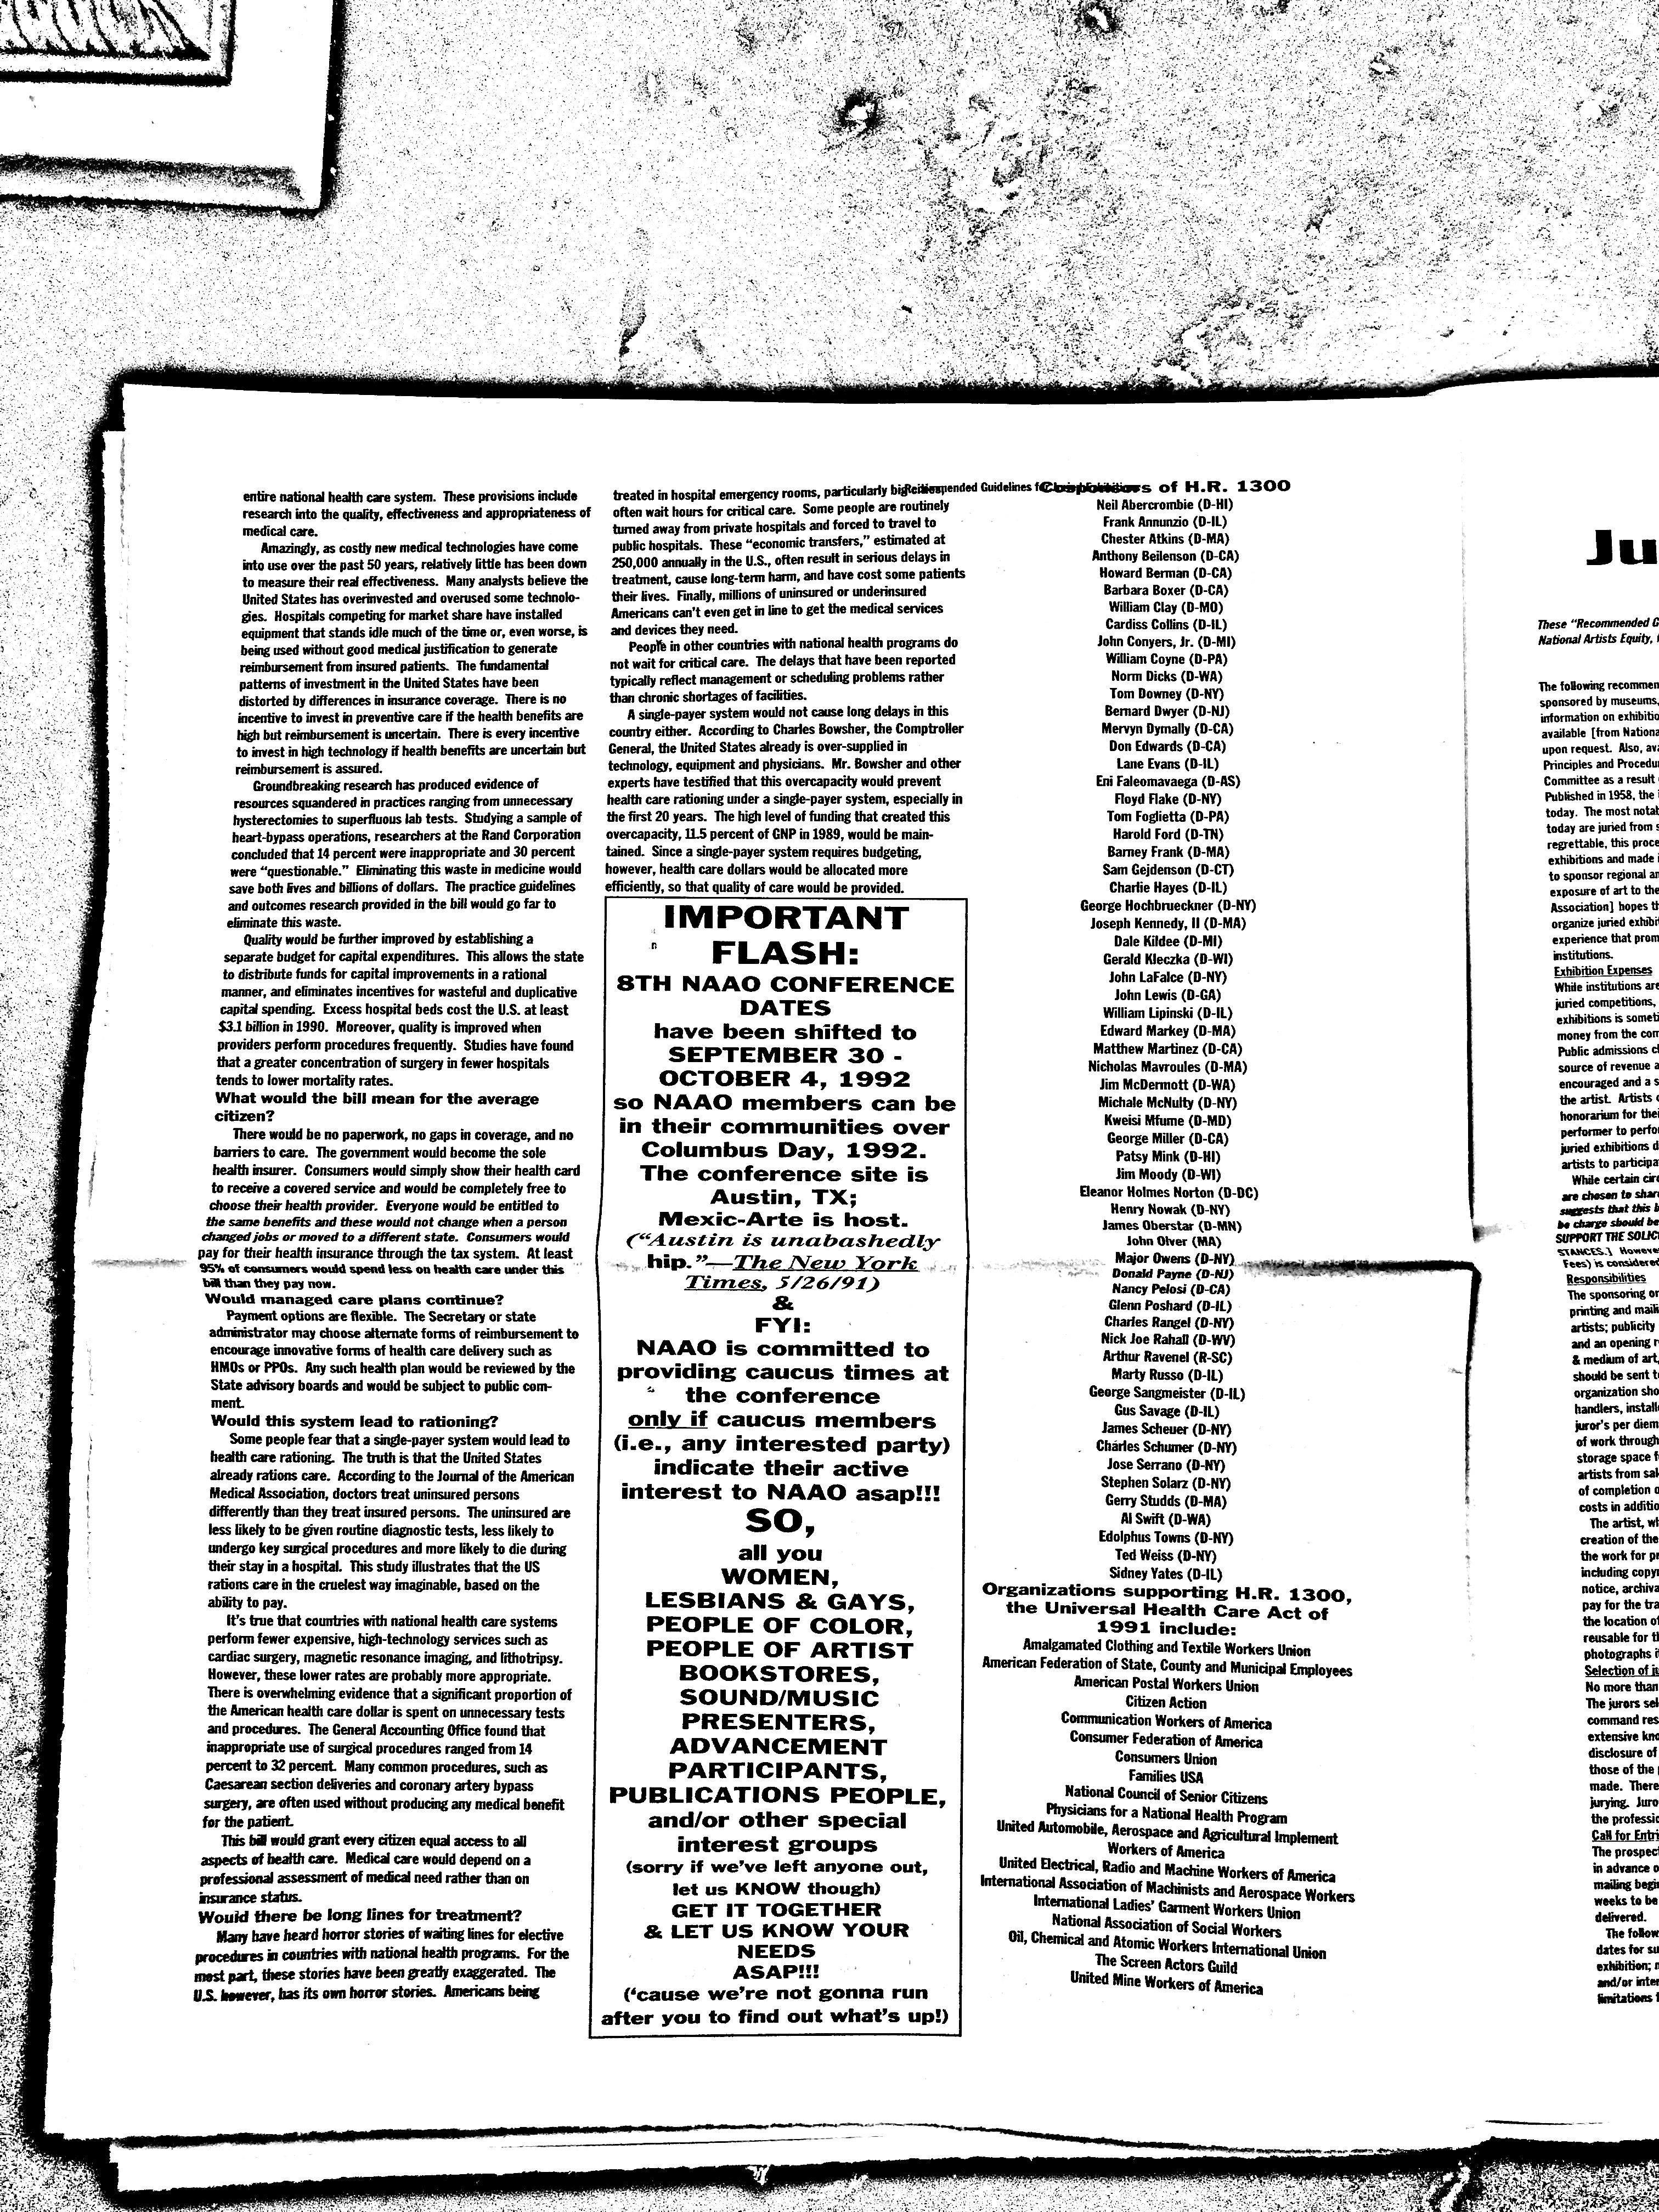 February 1992 - NAAO Bulletin Page 14.jpg